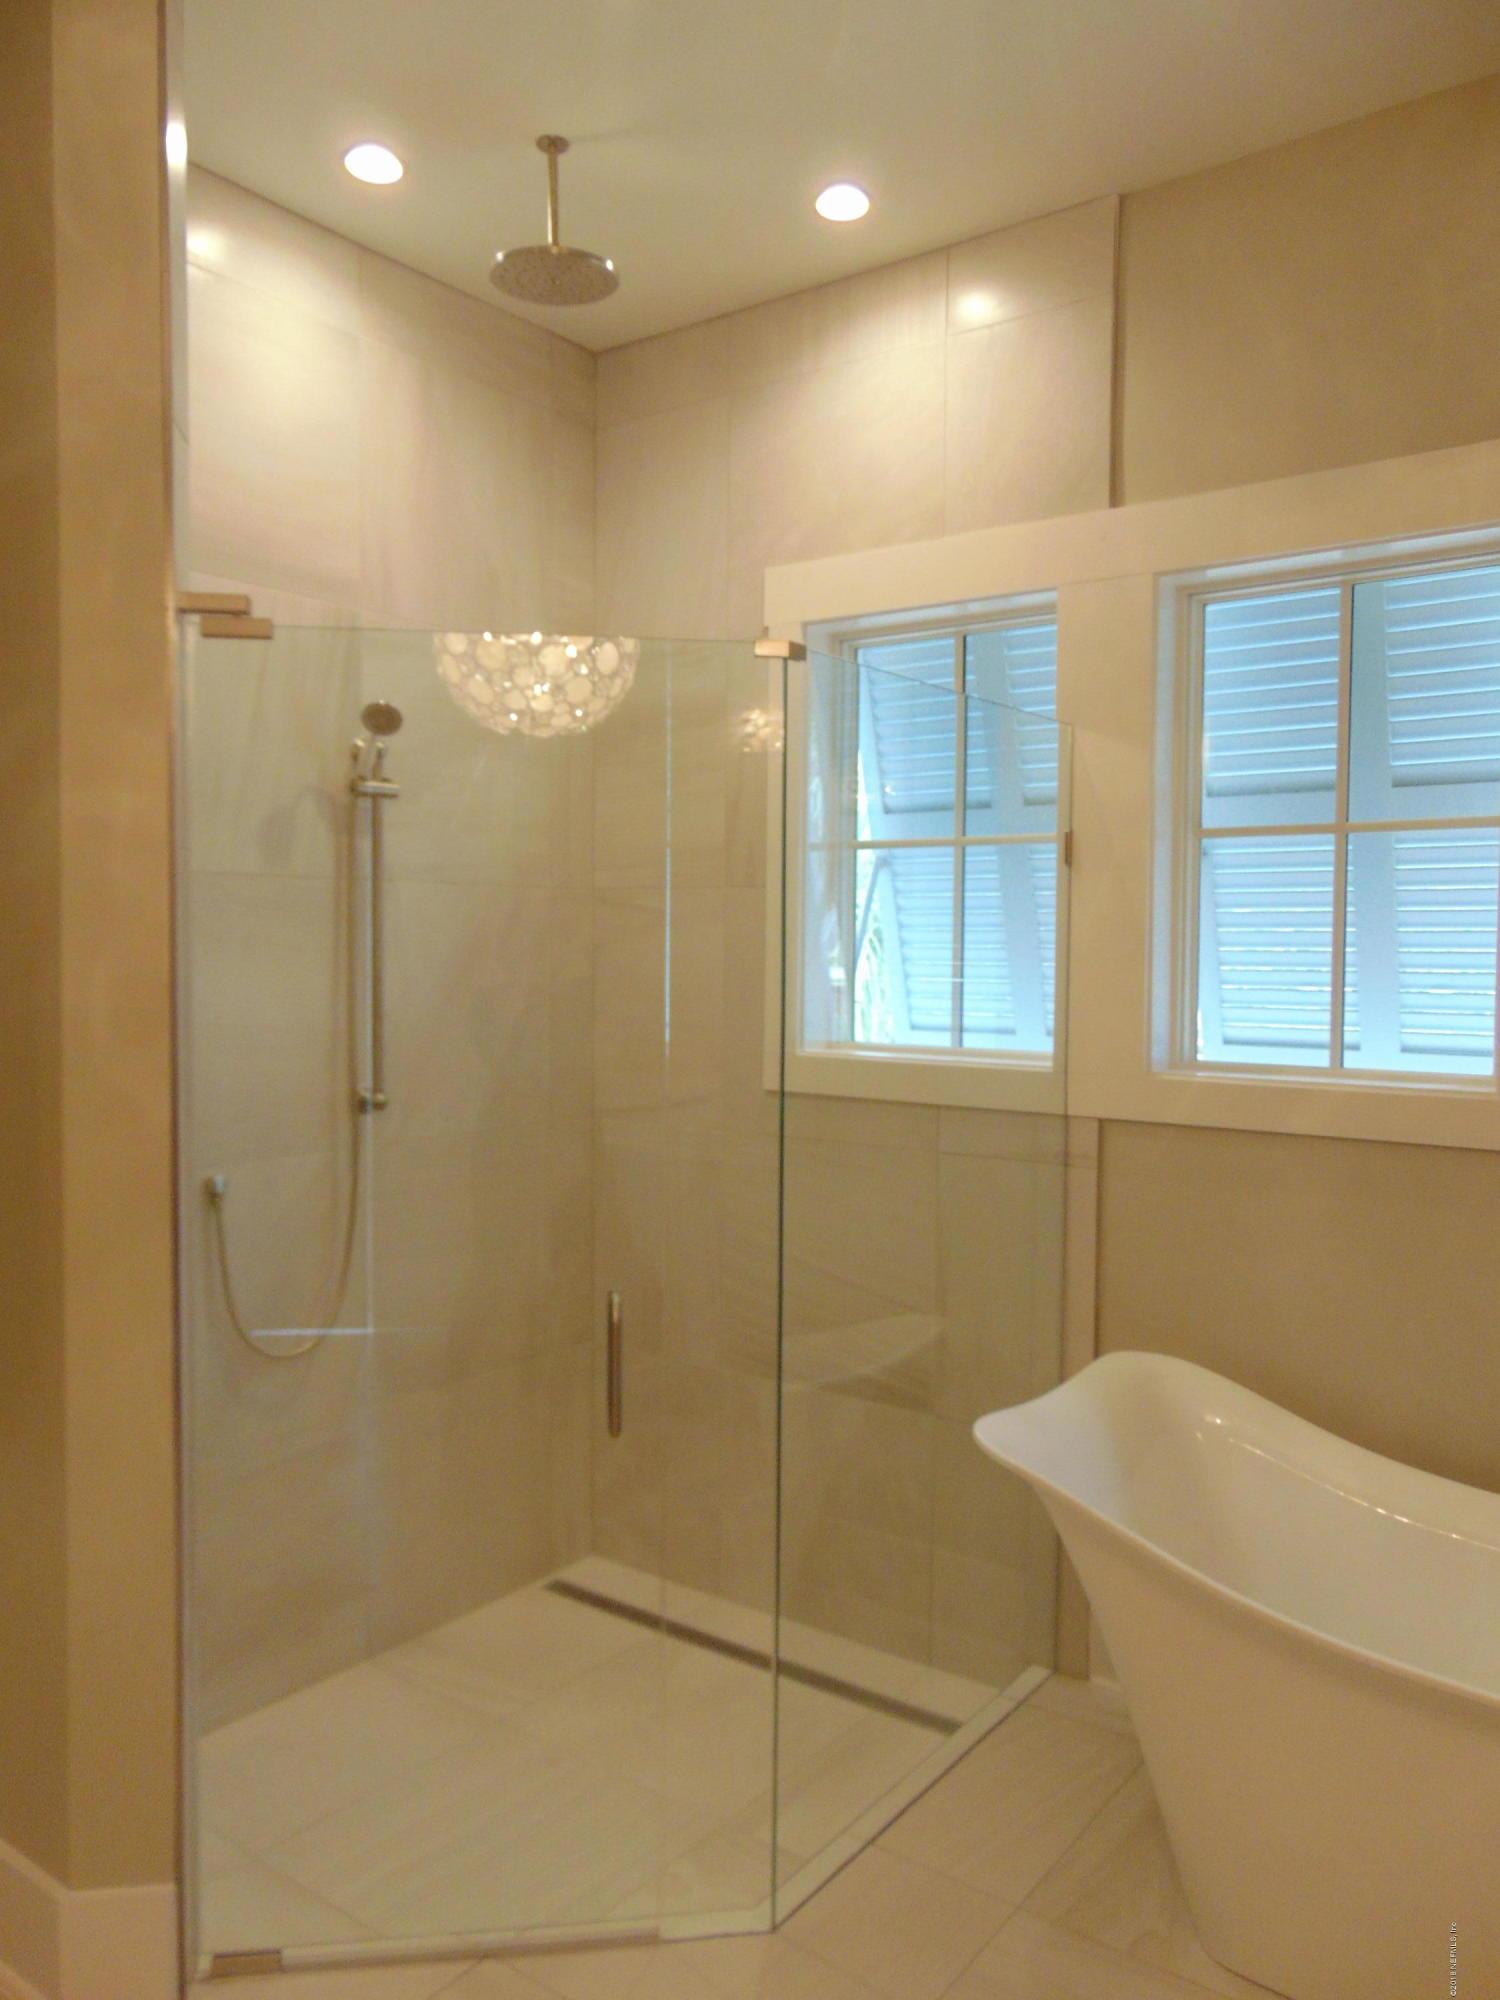 21 OASIS CLUB, PONTE VEDRA, FLORIDA 32082, 4 Bedrooms Bedrooms, ,5 BathroomsBathrooms,Residential - single family,For sale,OASIS CLUB,915614